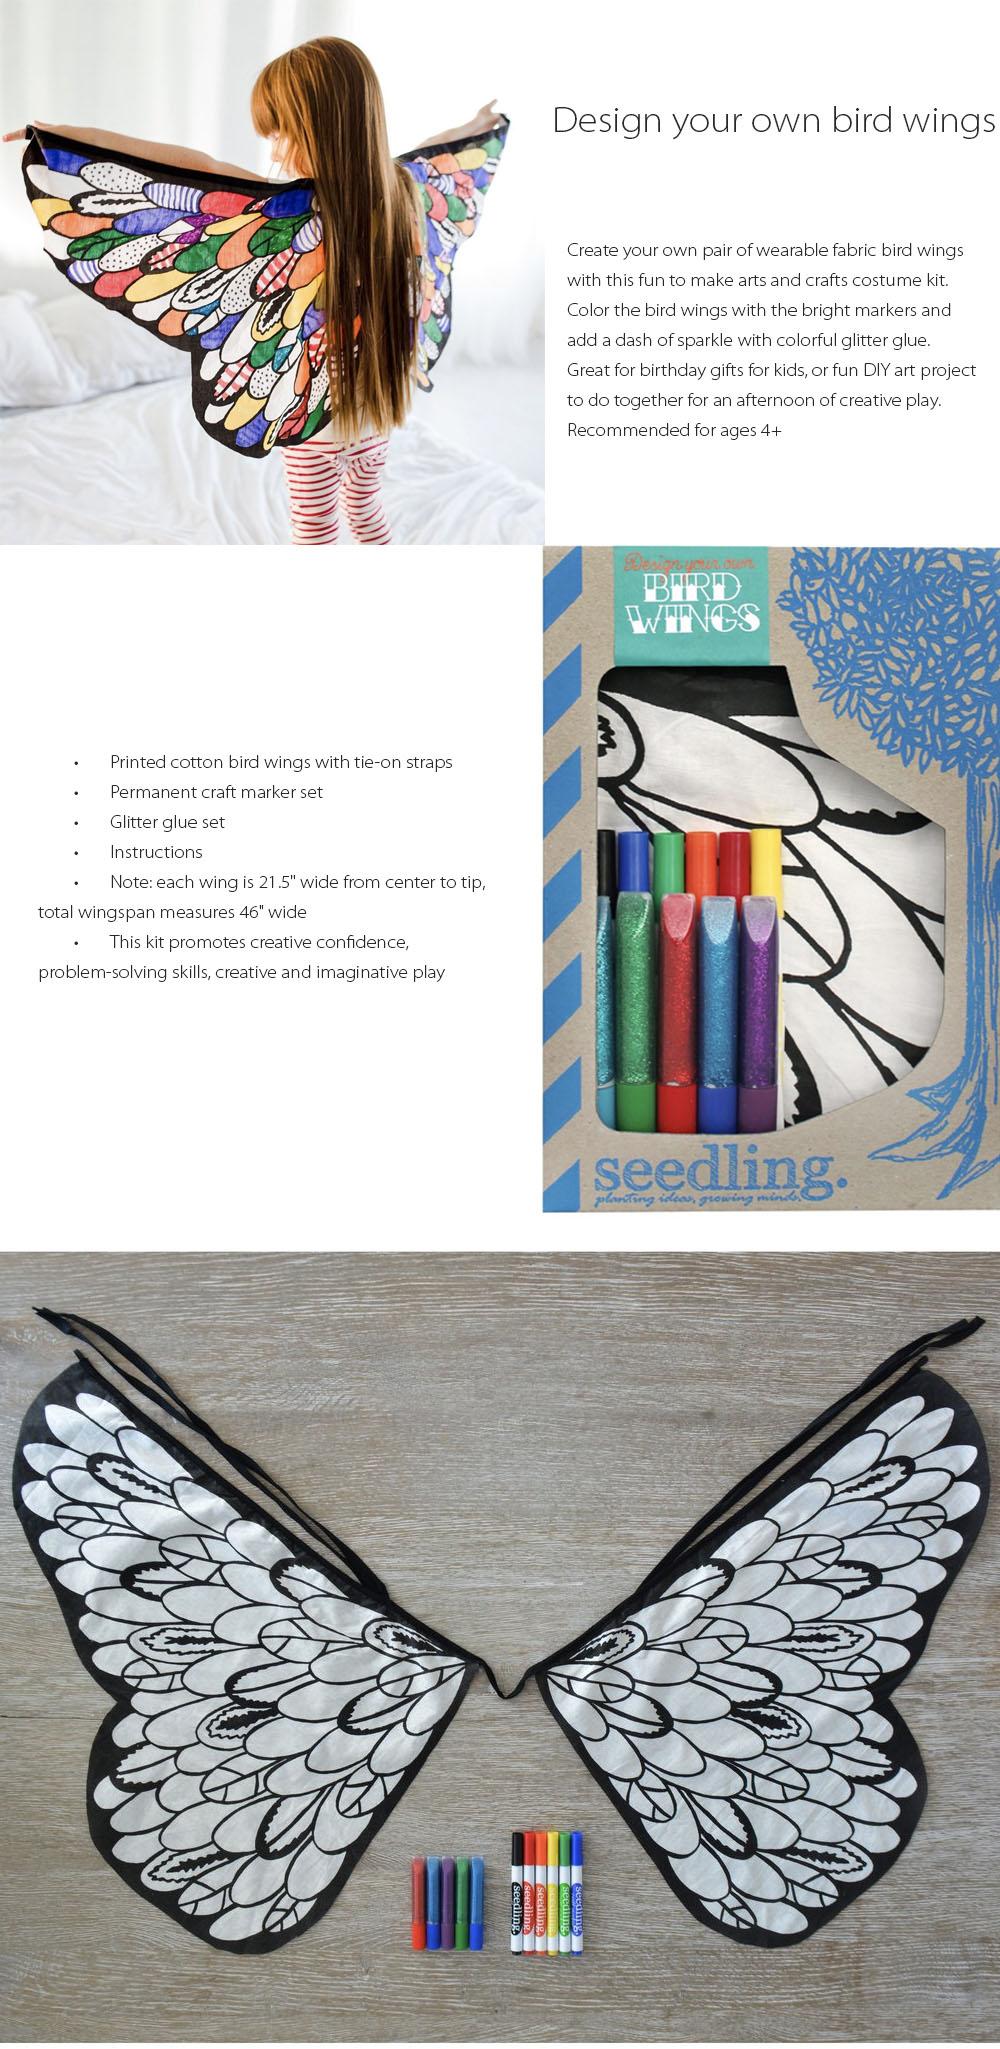 Design Your Own Bird Wings Apollobox